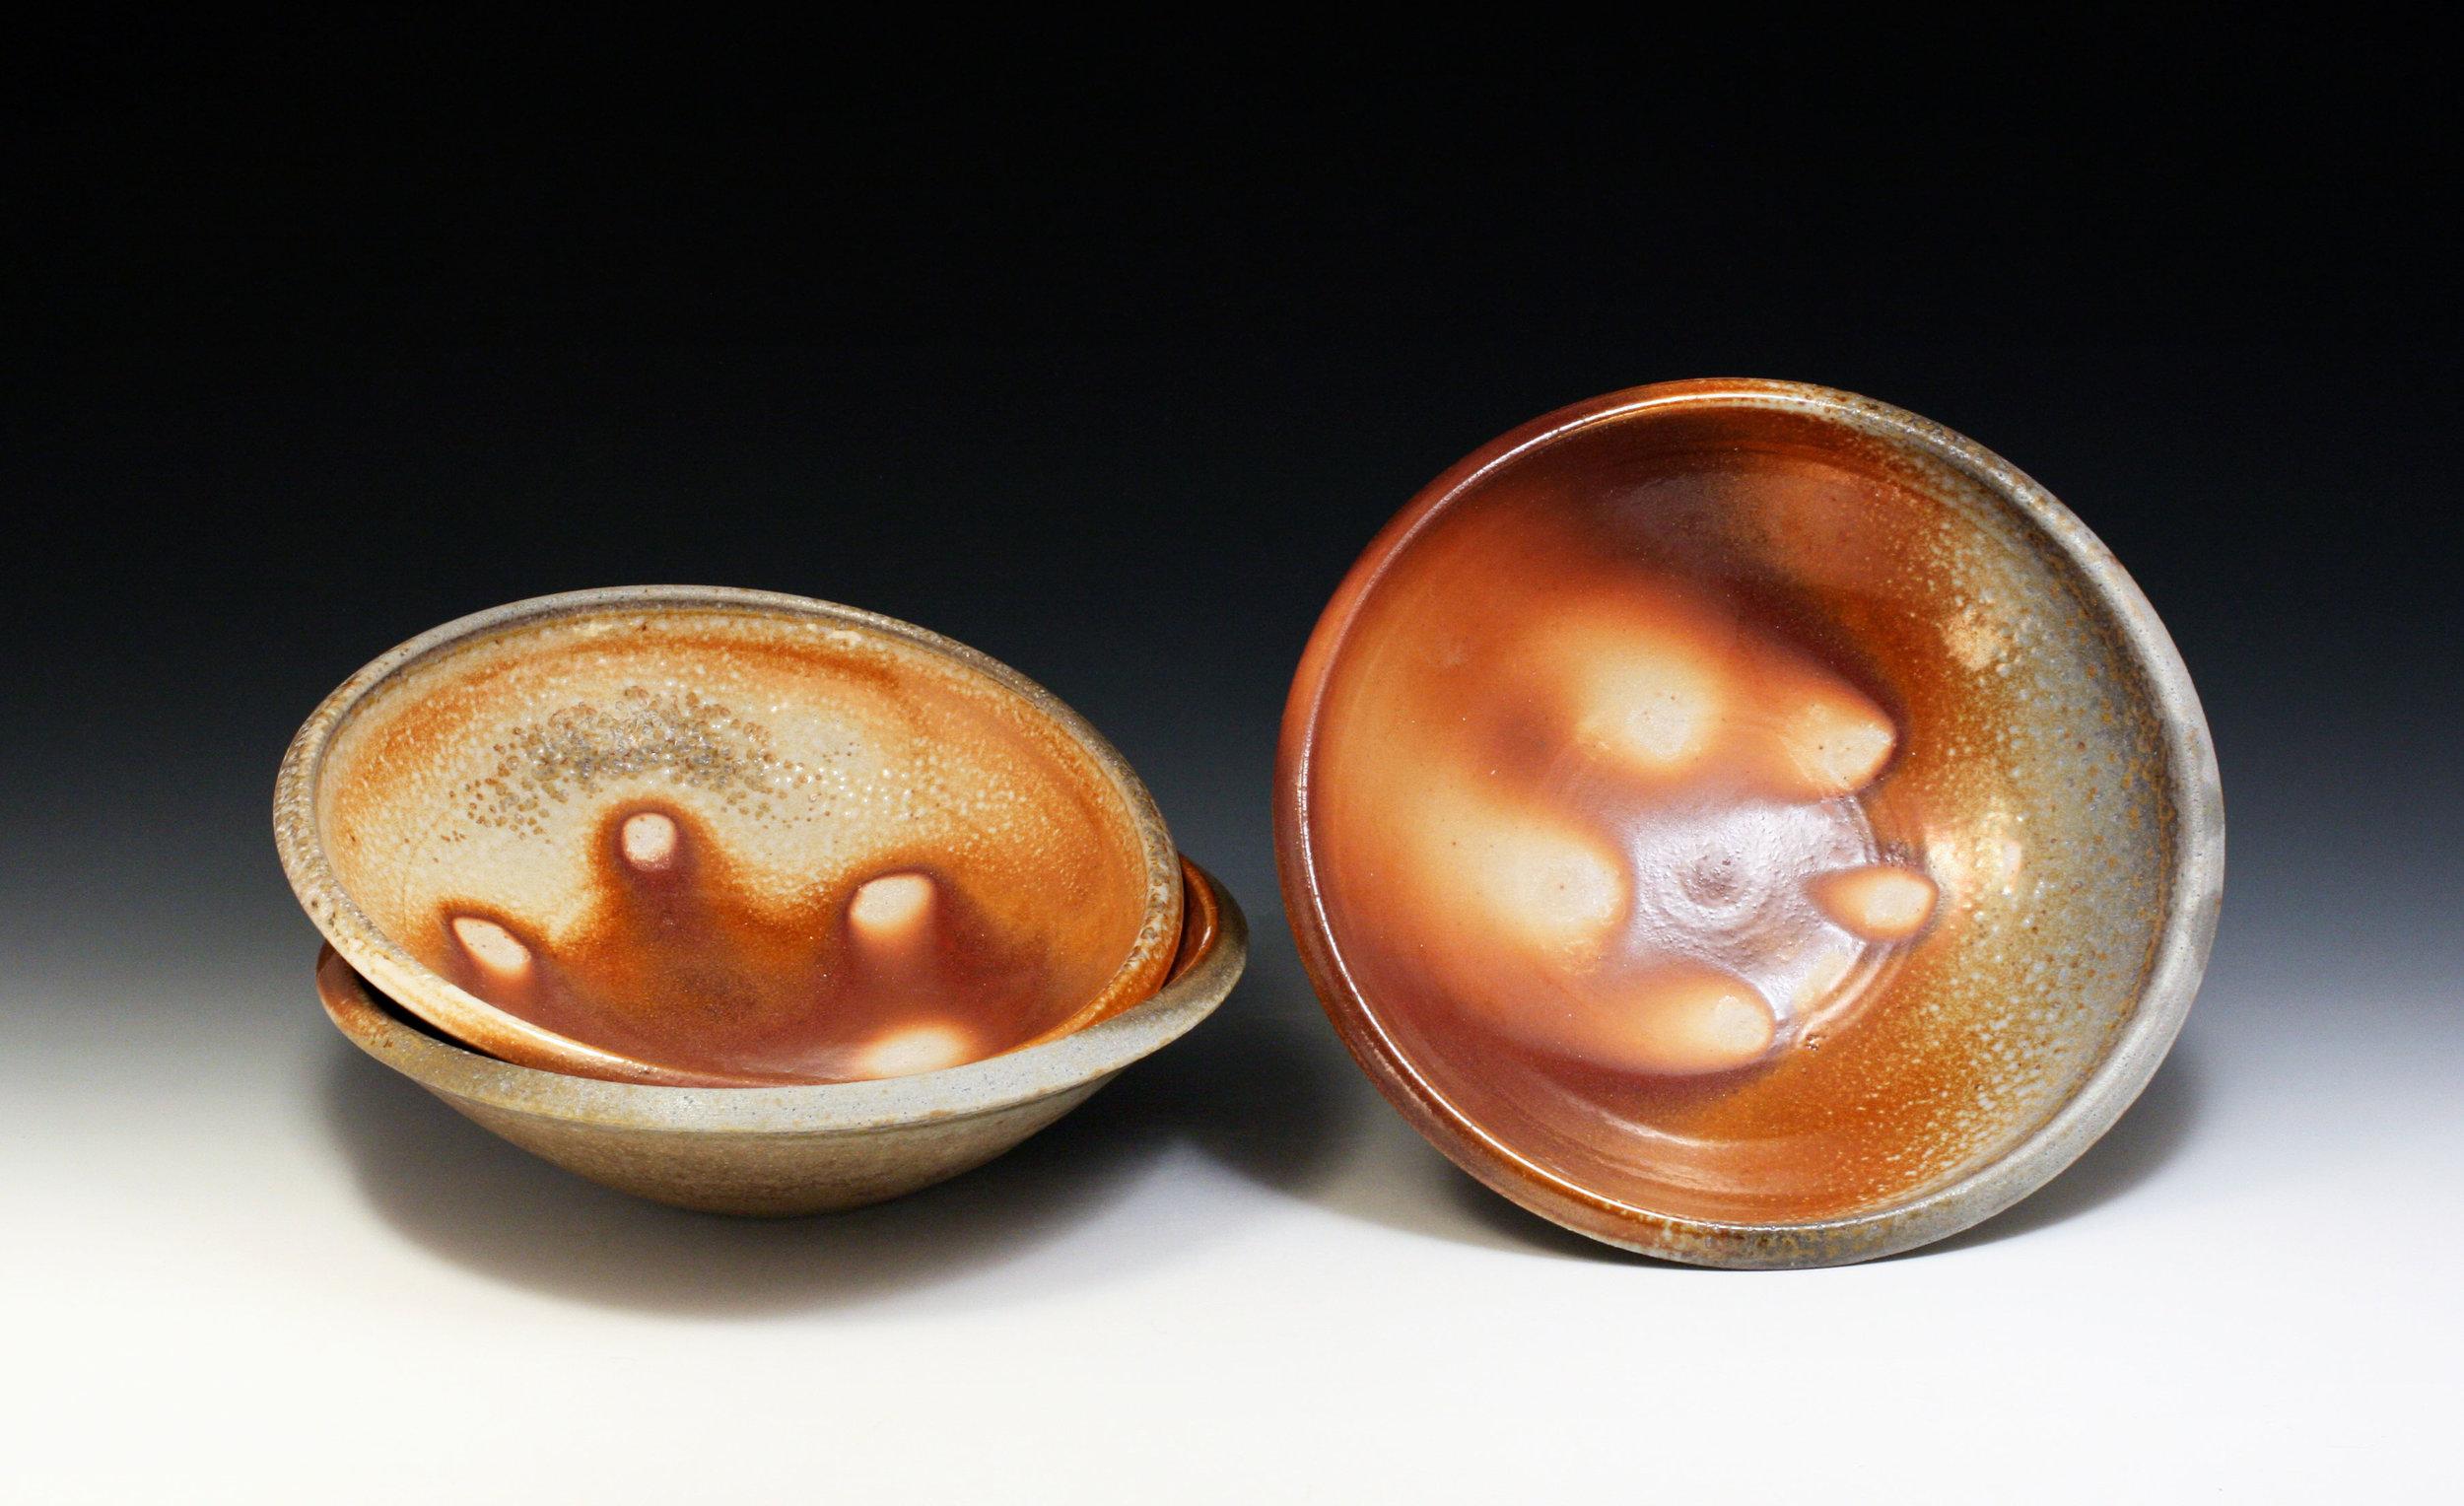 Bowls-1a-web.jpg